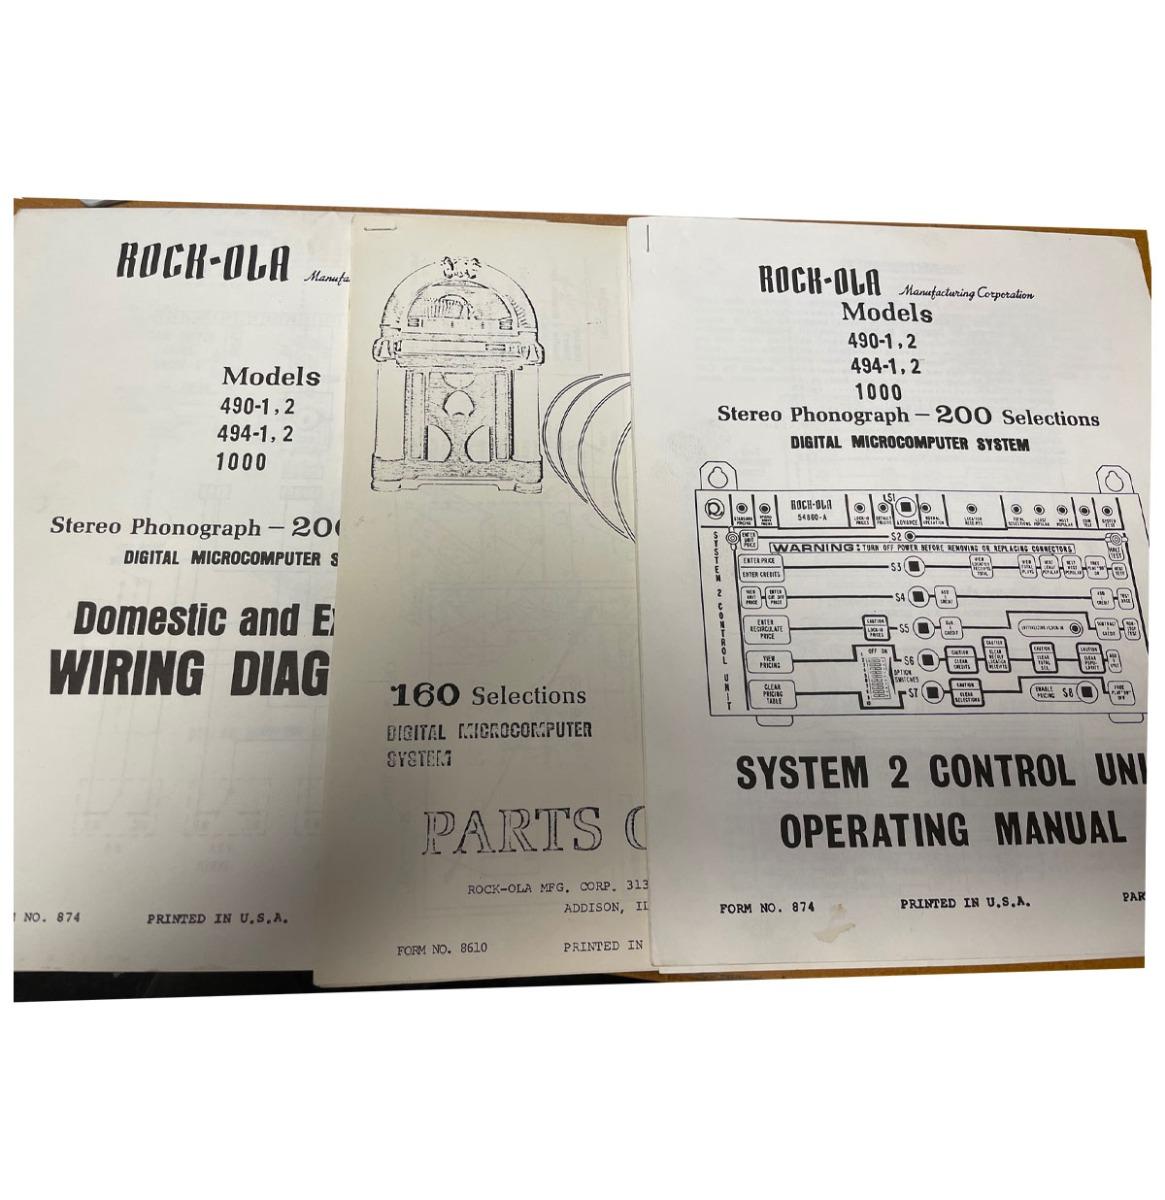 Rock-Ola 490, 491 And 1000 Operating Manual